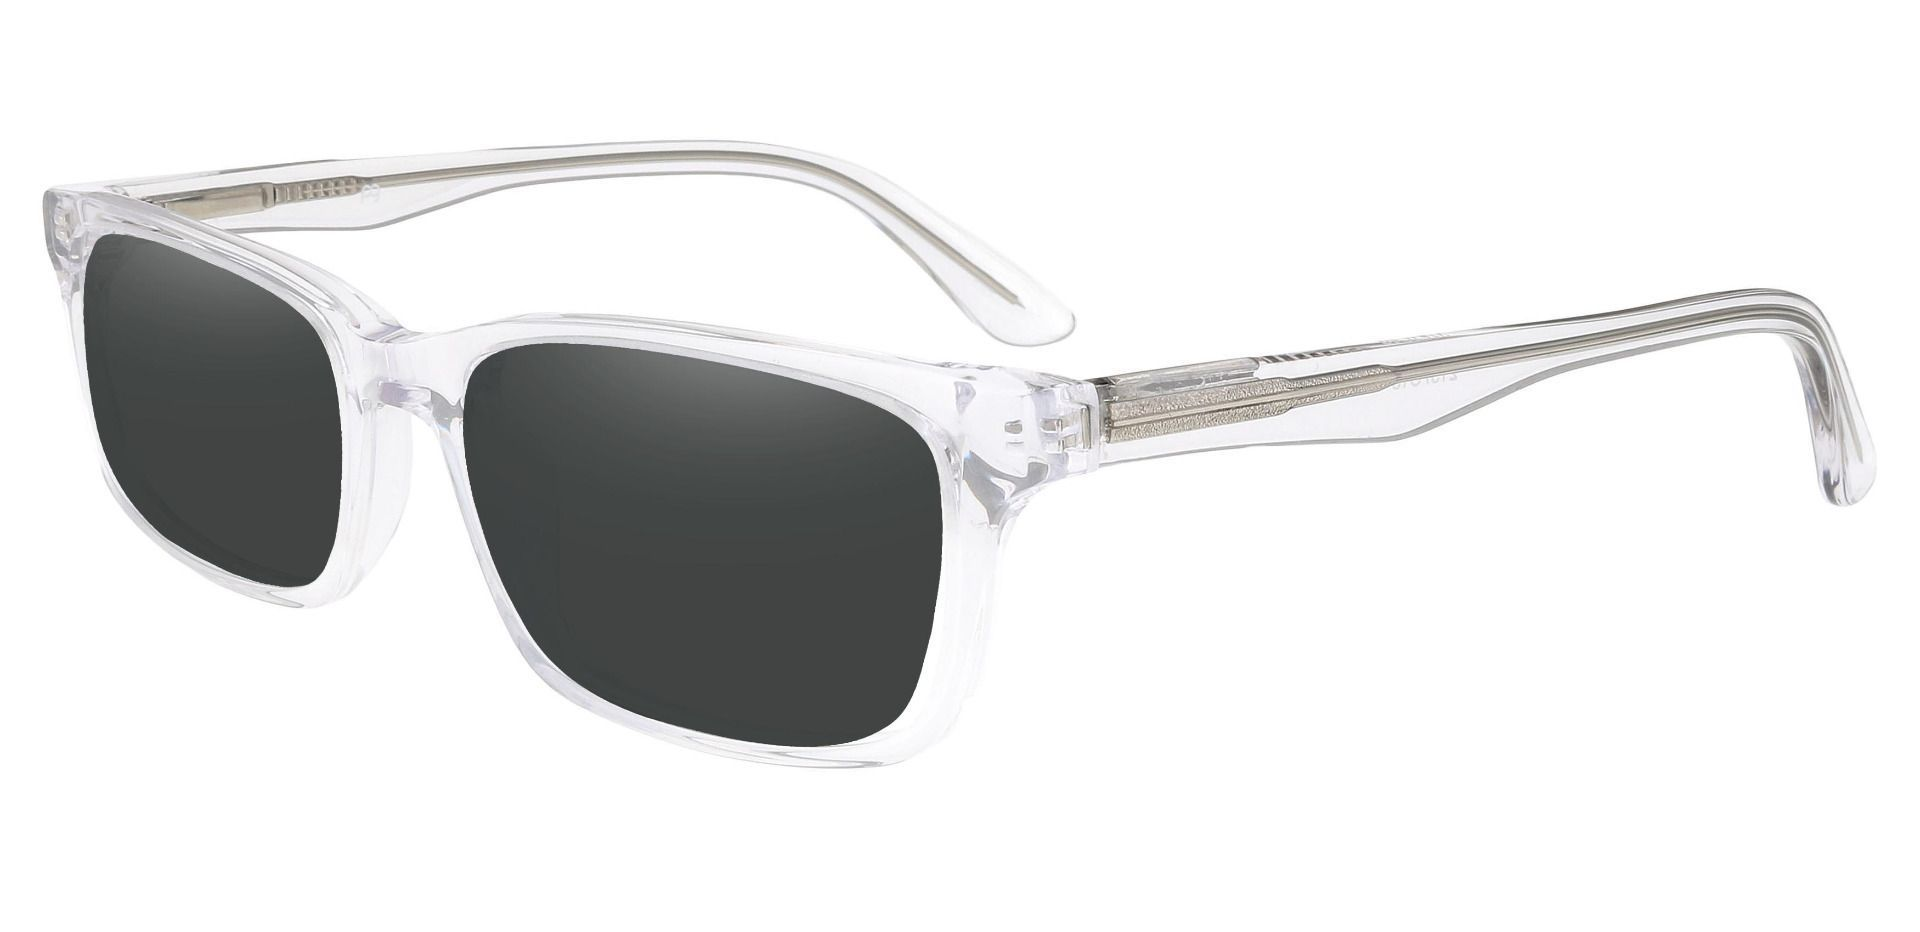 Ennis Rectangle Prescription Sunglasses - Clear Frame With Gray Lenses